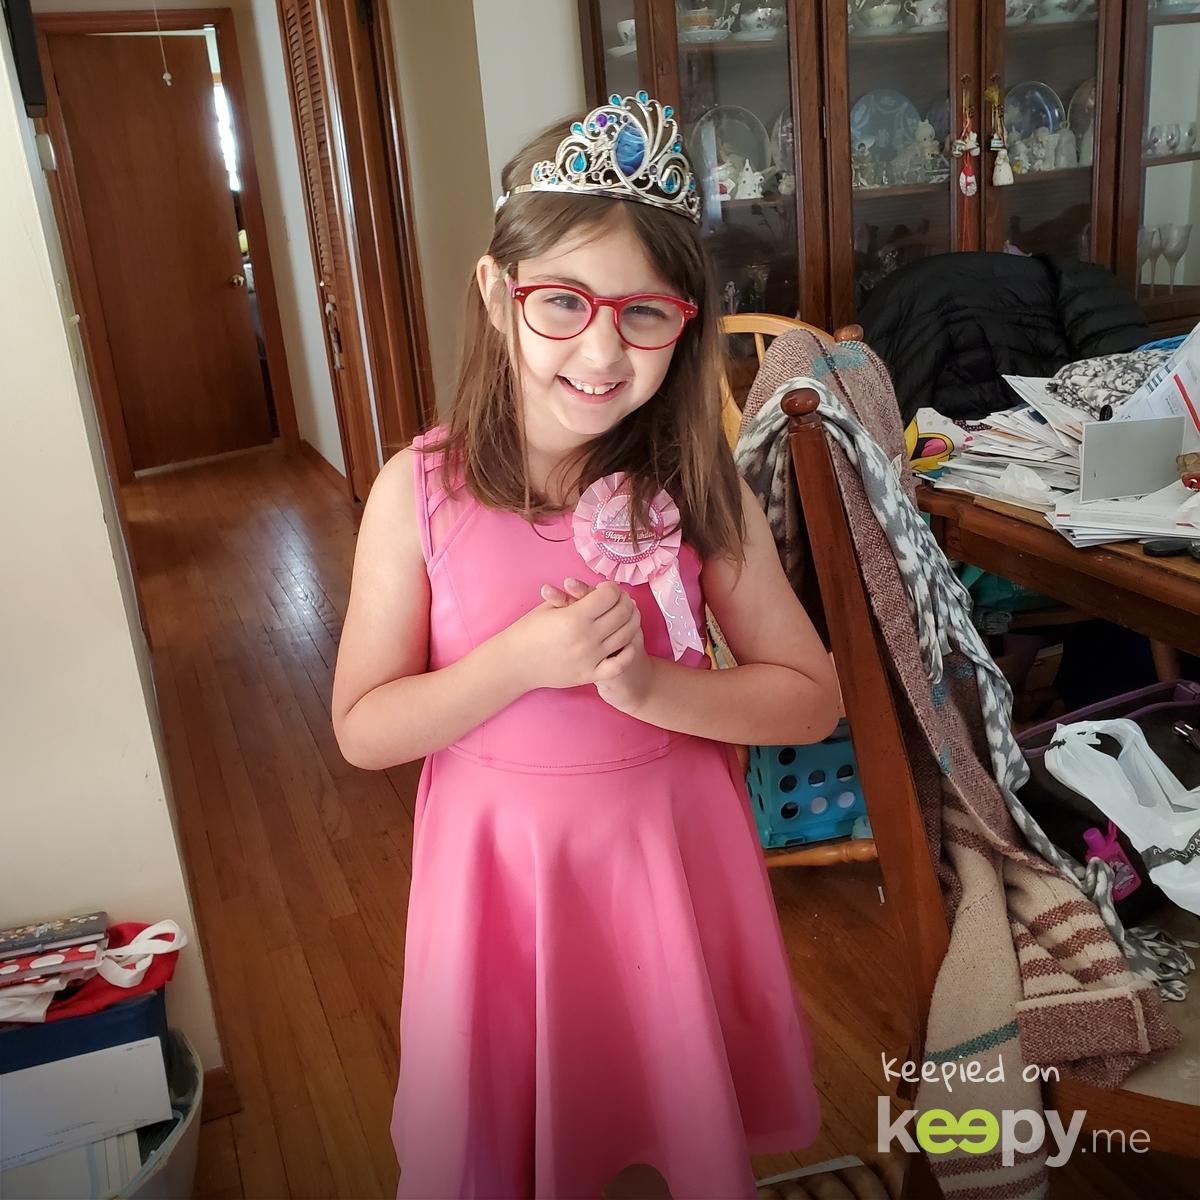 samantha 8 birthday » Keepy.me